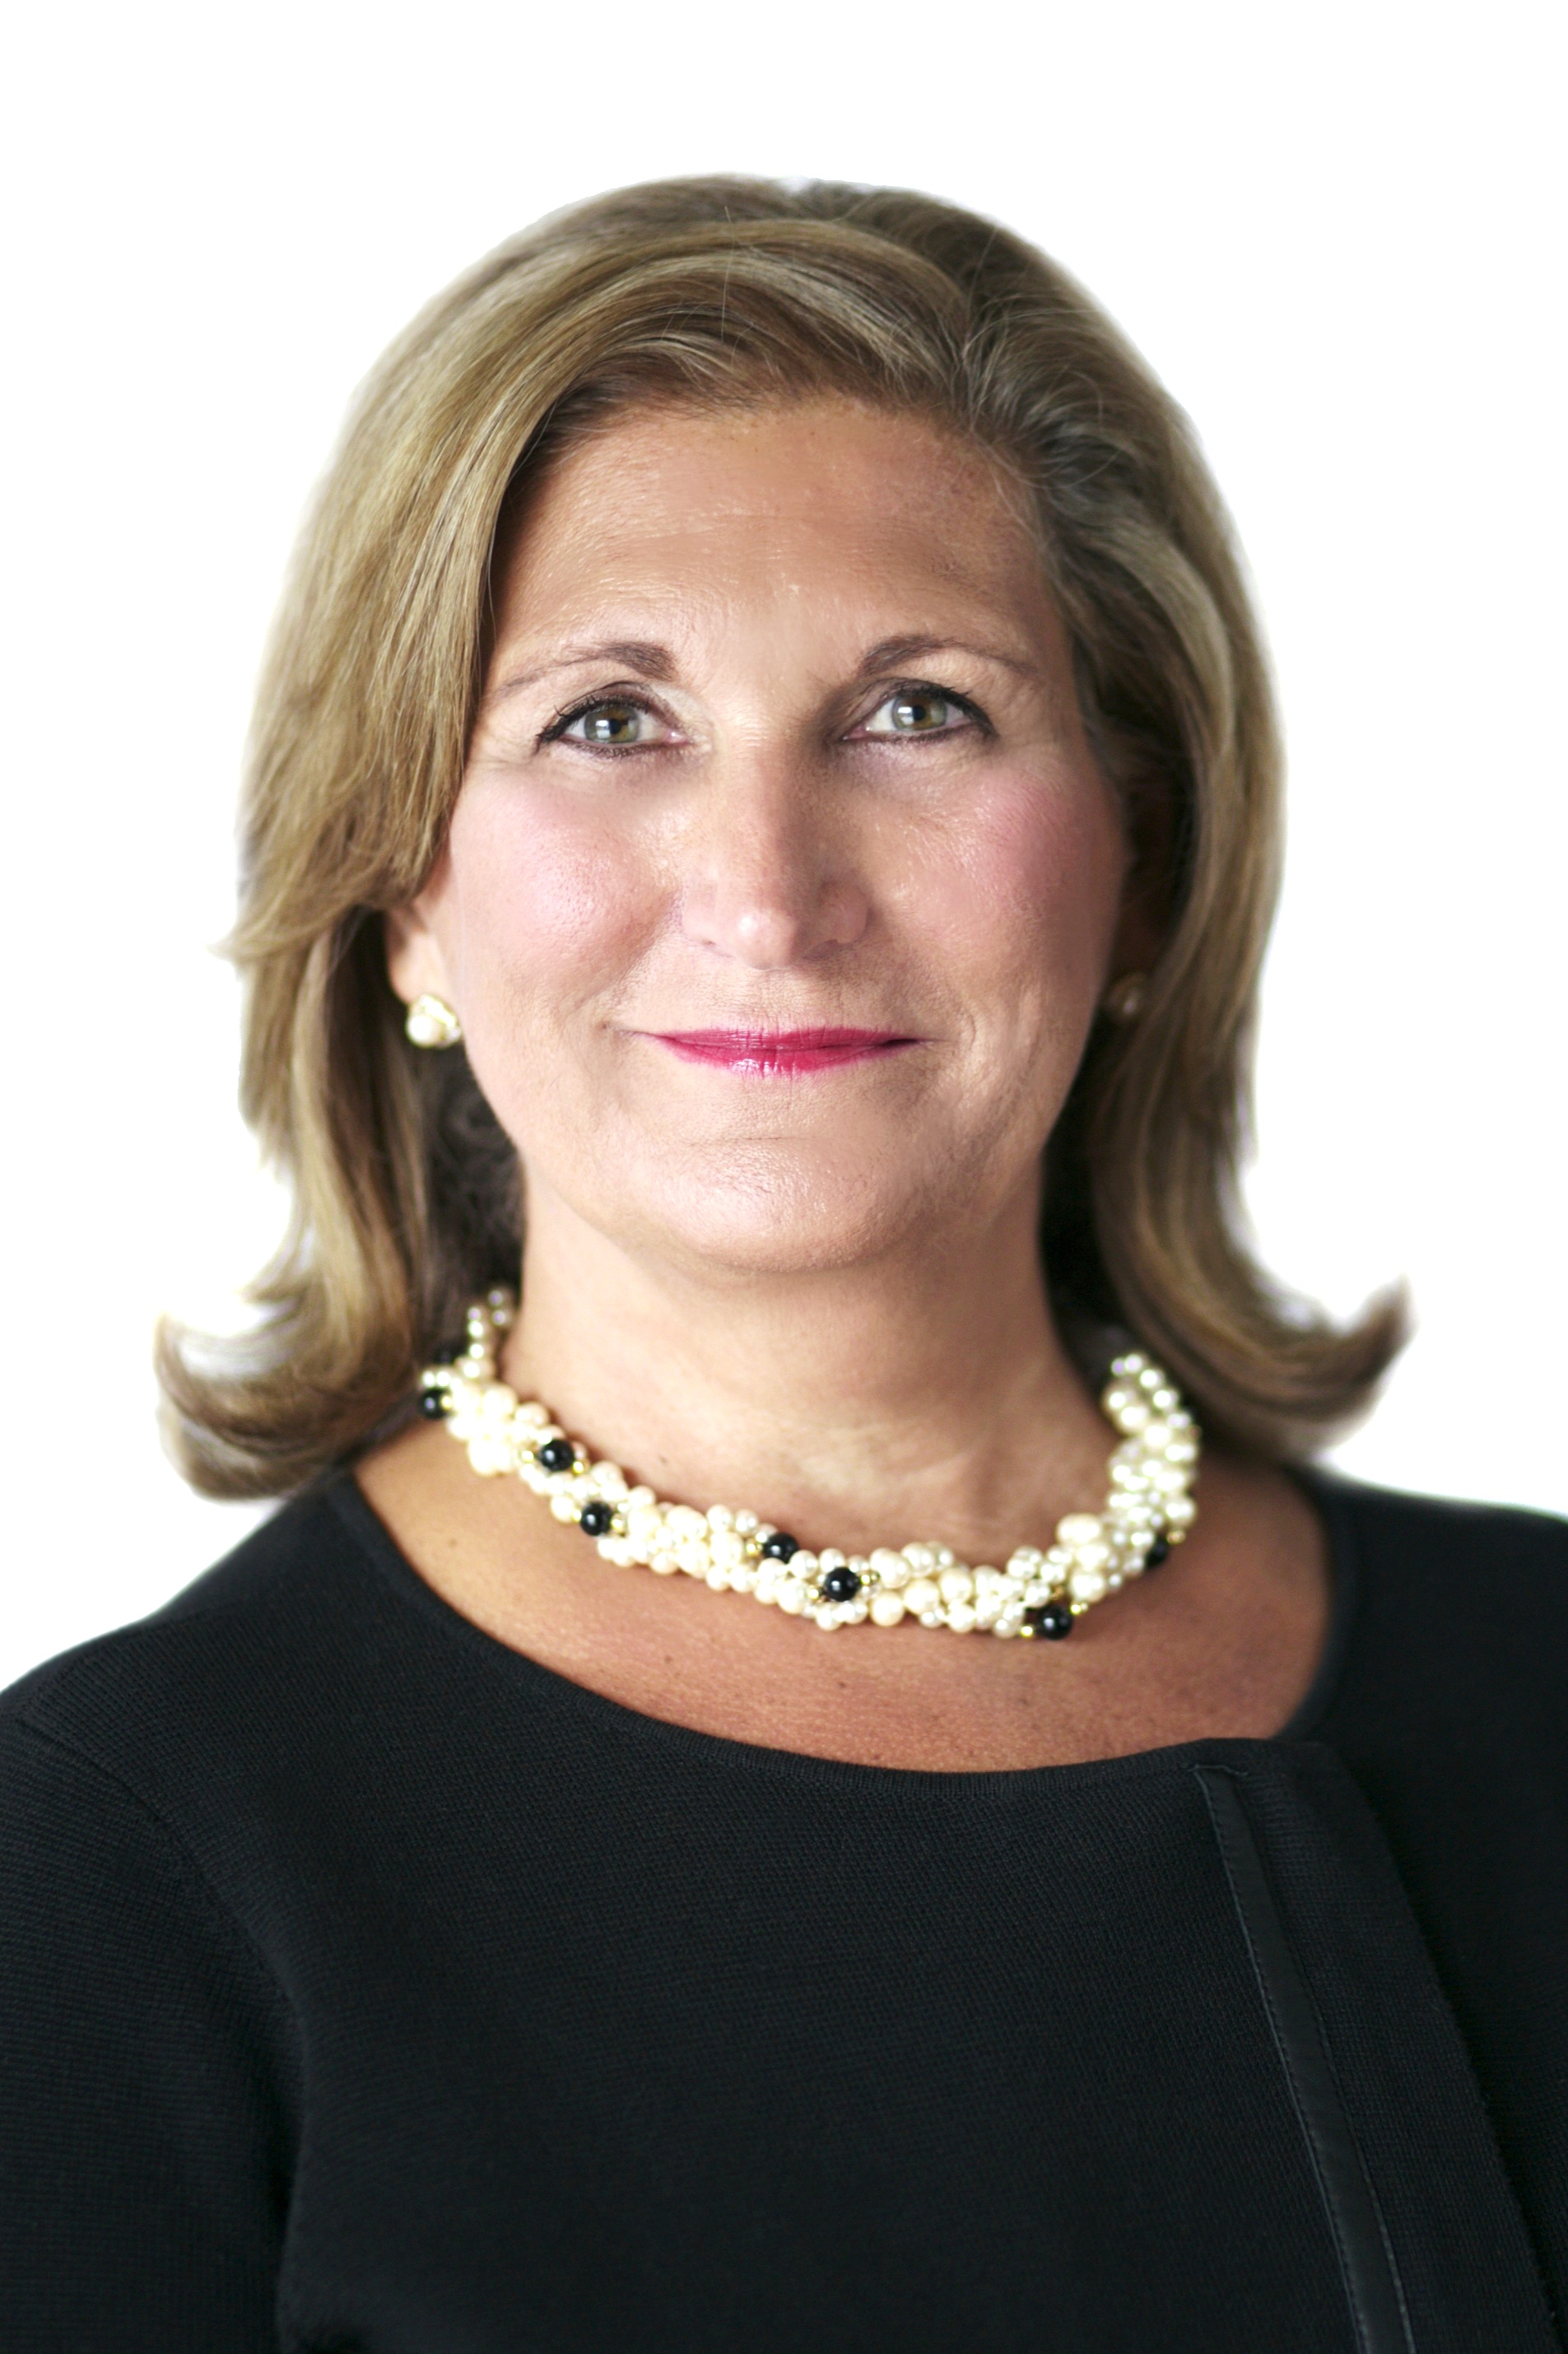 Deborah Smallwood # Strategy Meets Action